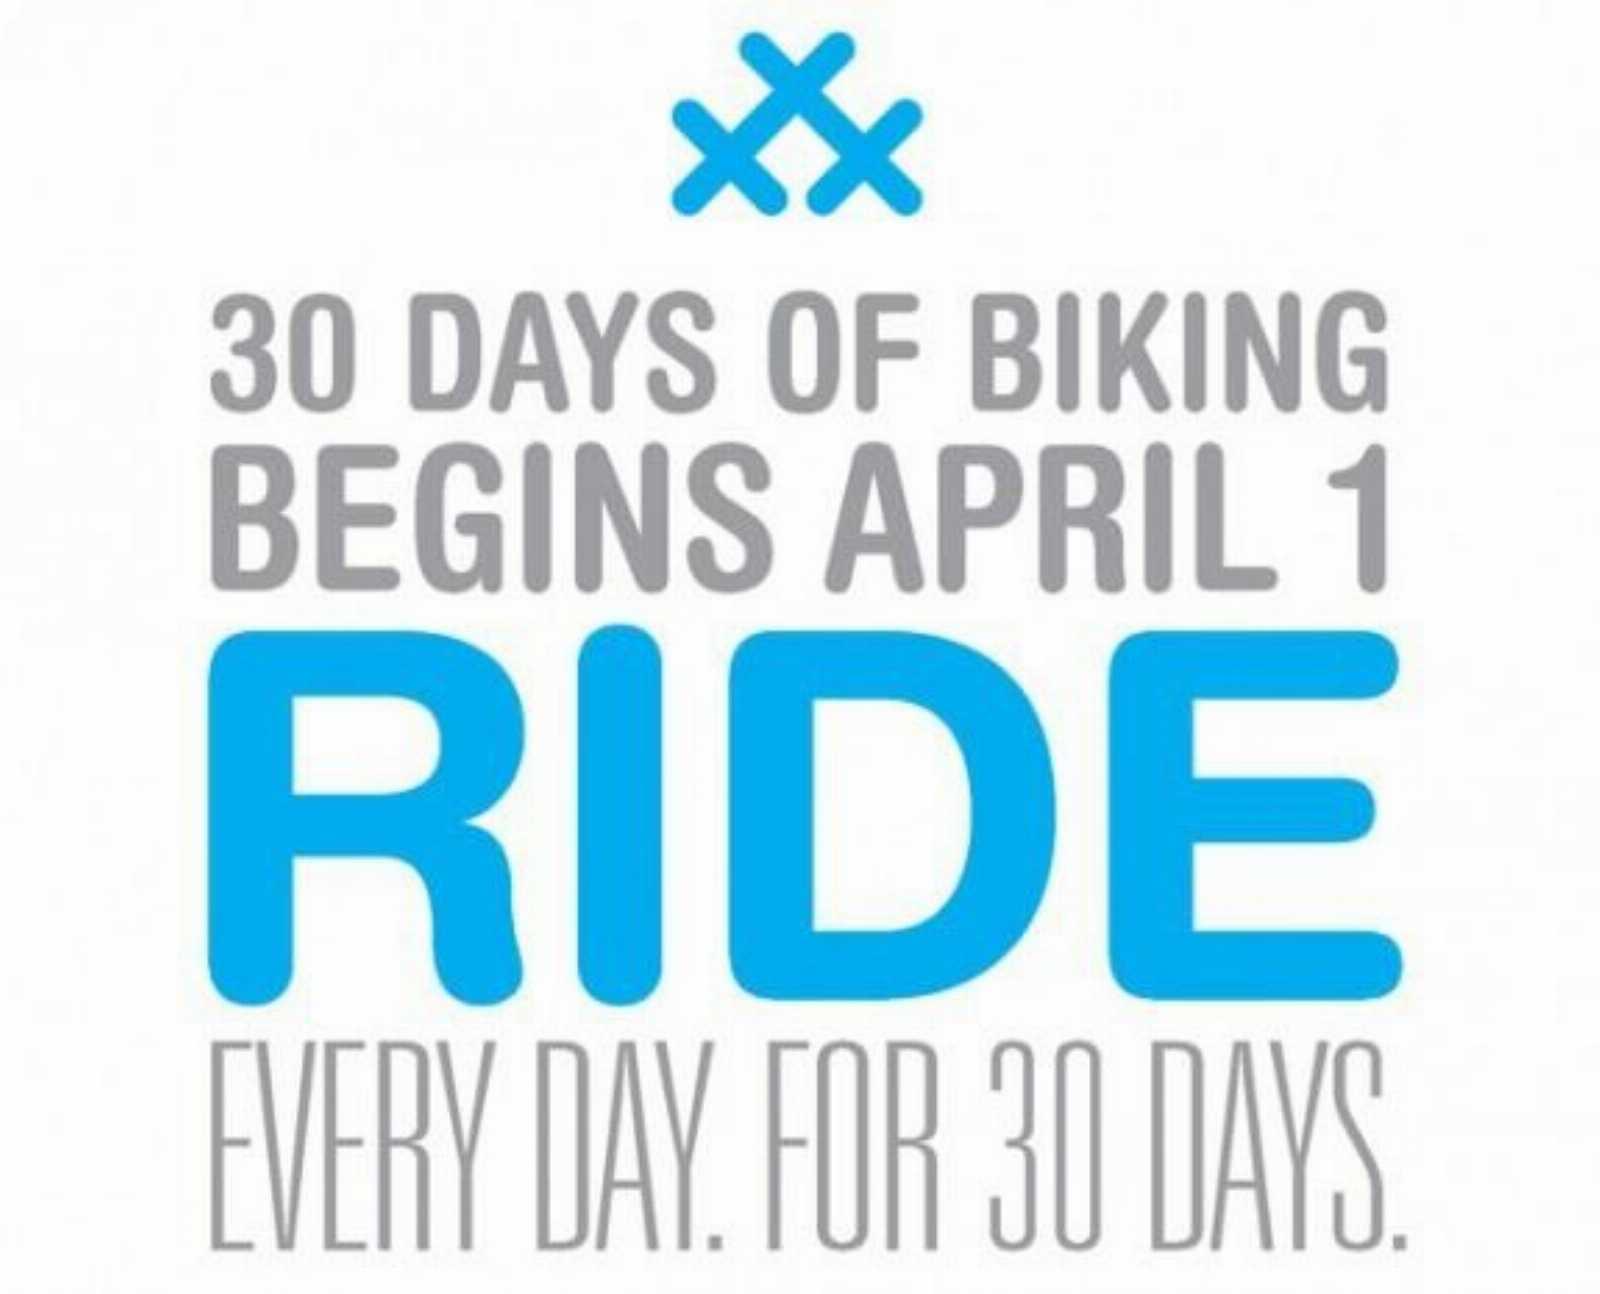 Акция 30 дней на велосипеде!